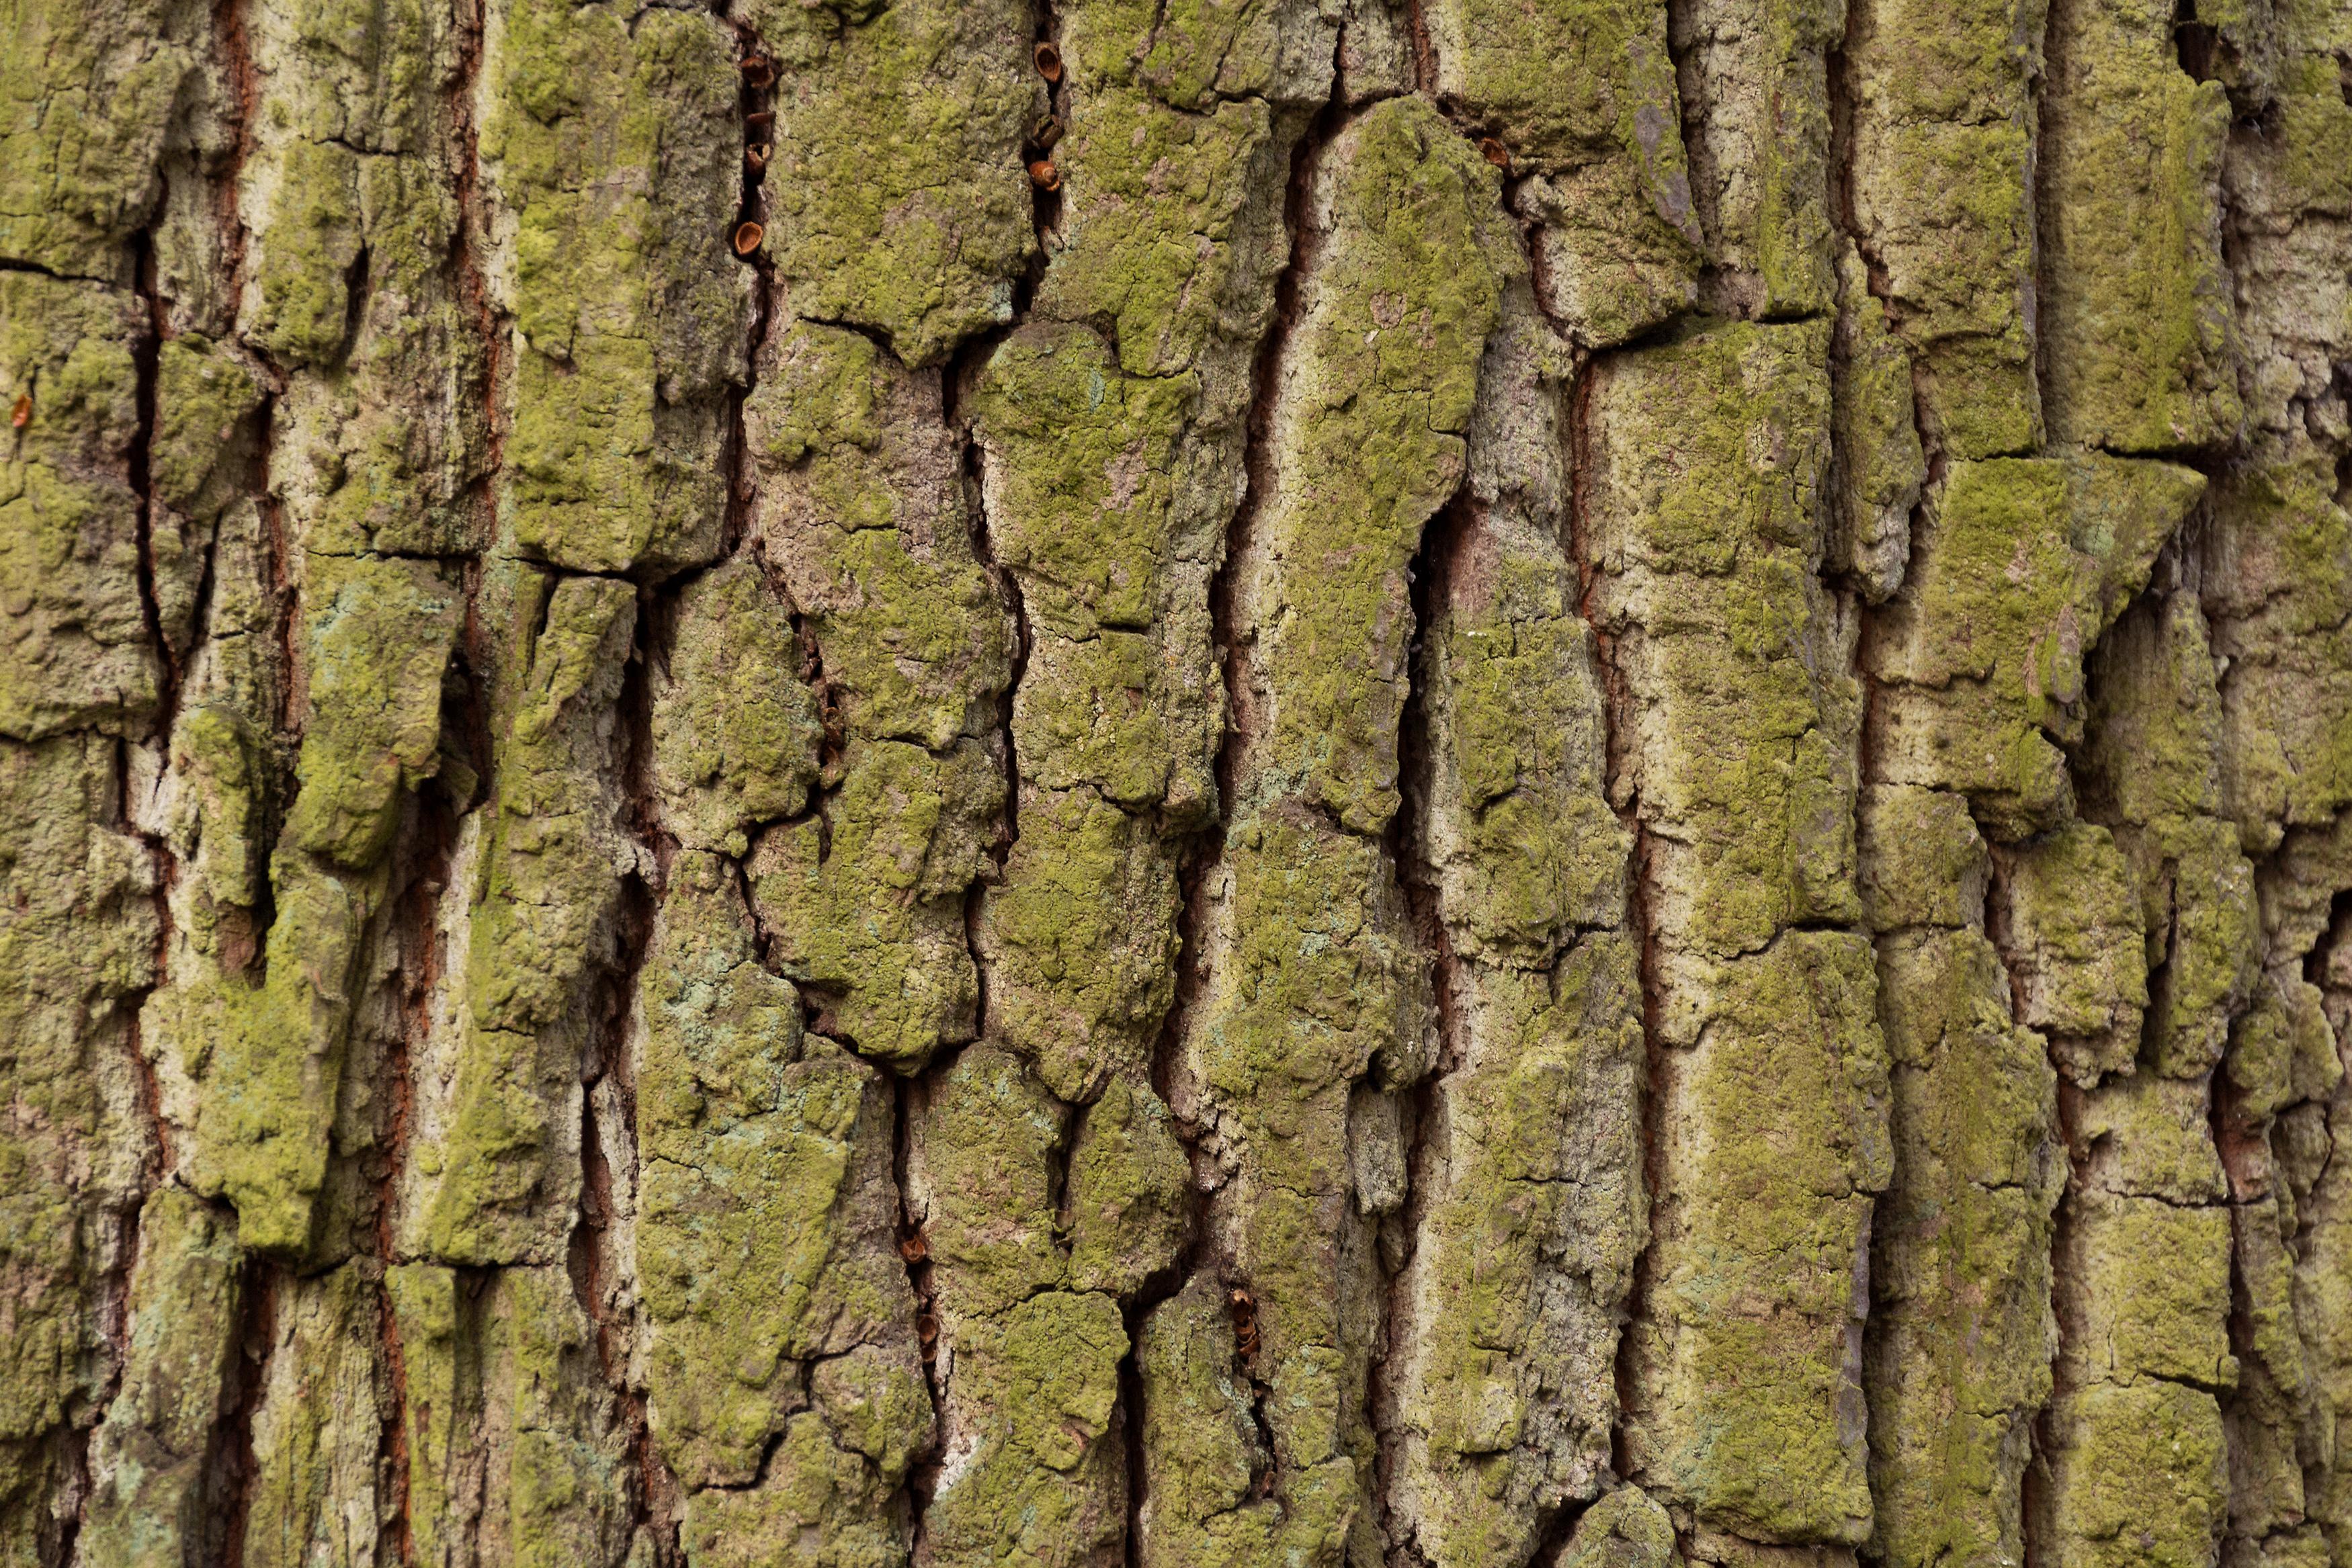 FREE IMAGE: Tree bark texture - Libreshot Public Domain Photos